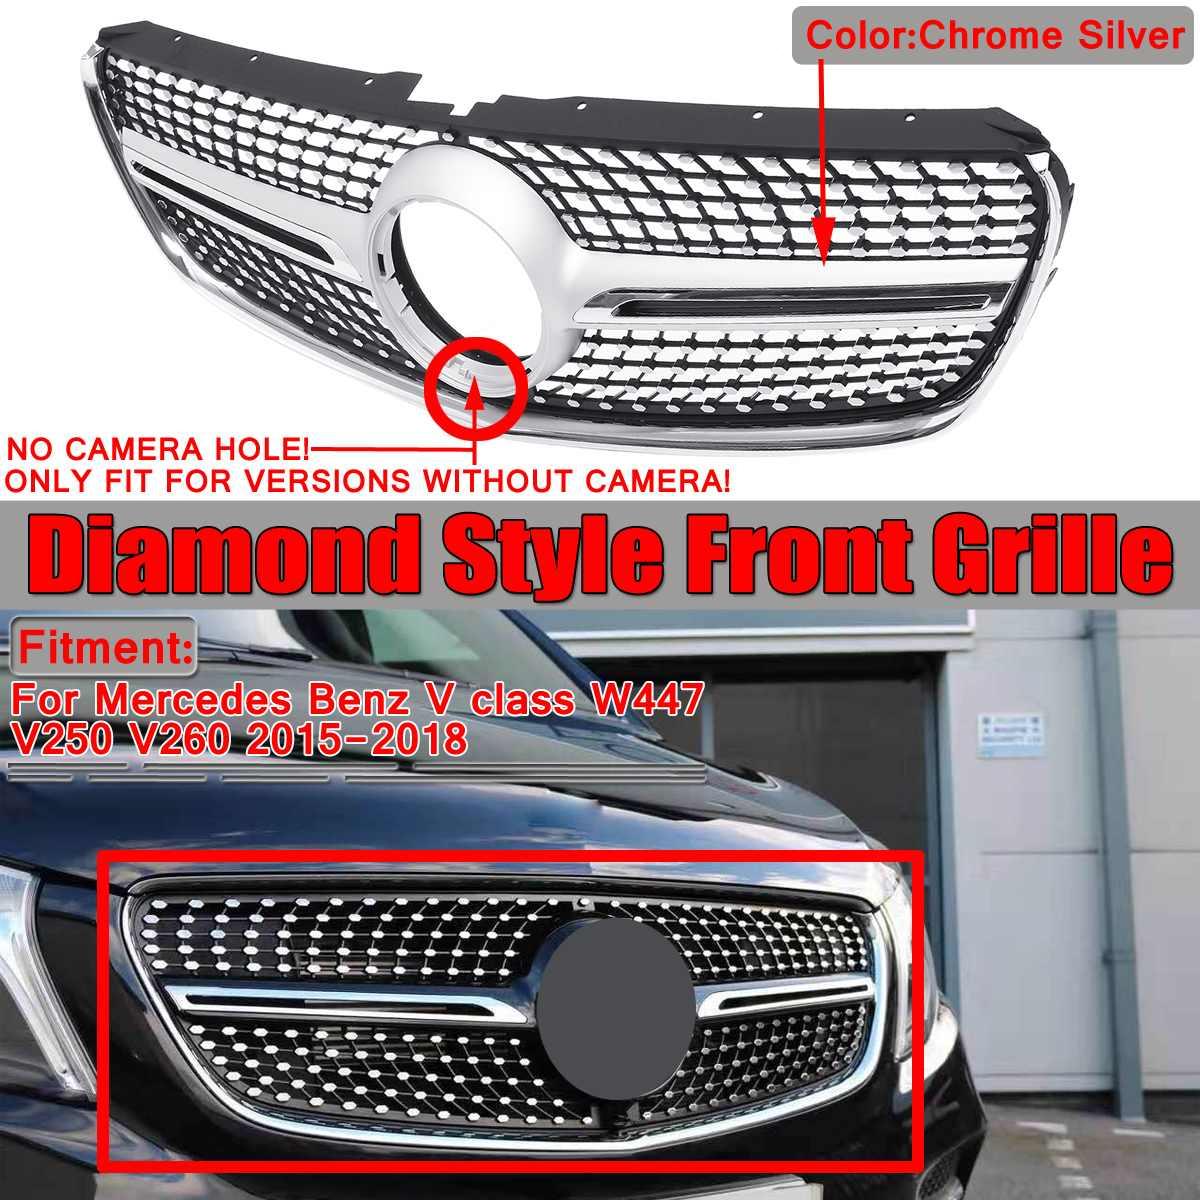 W447 V250 V260 Алмазный автомобильный передний бампер решетка гриль для Mercedes для Benz V Class W447 V250 V260 2015 2016 2017 2018 без эмблемы